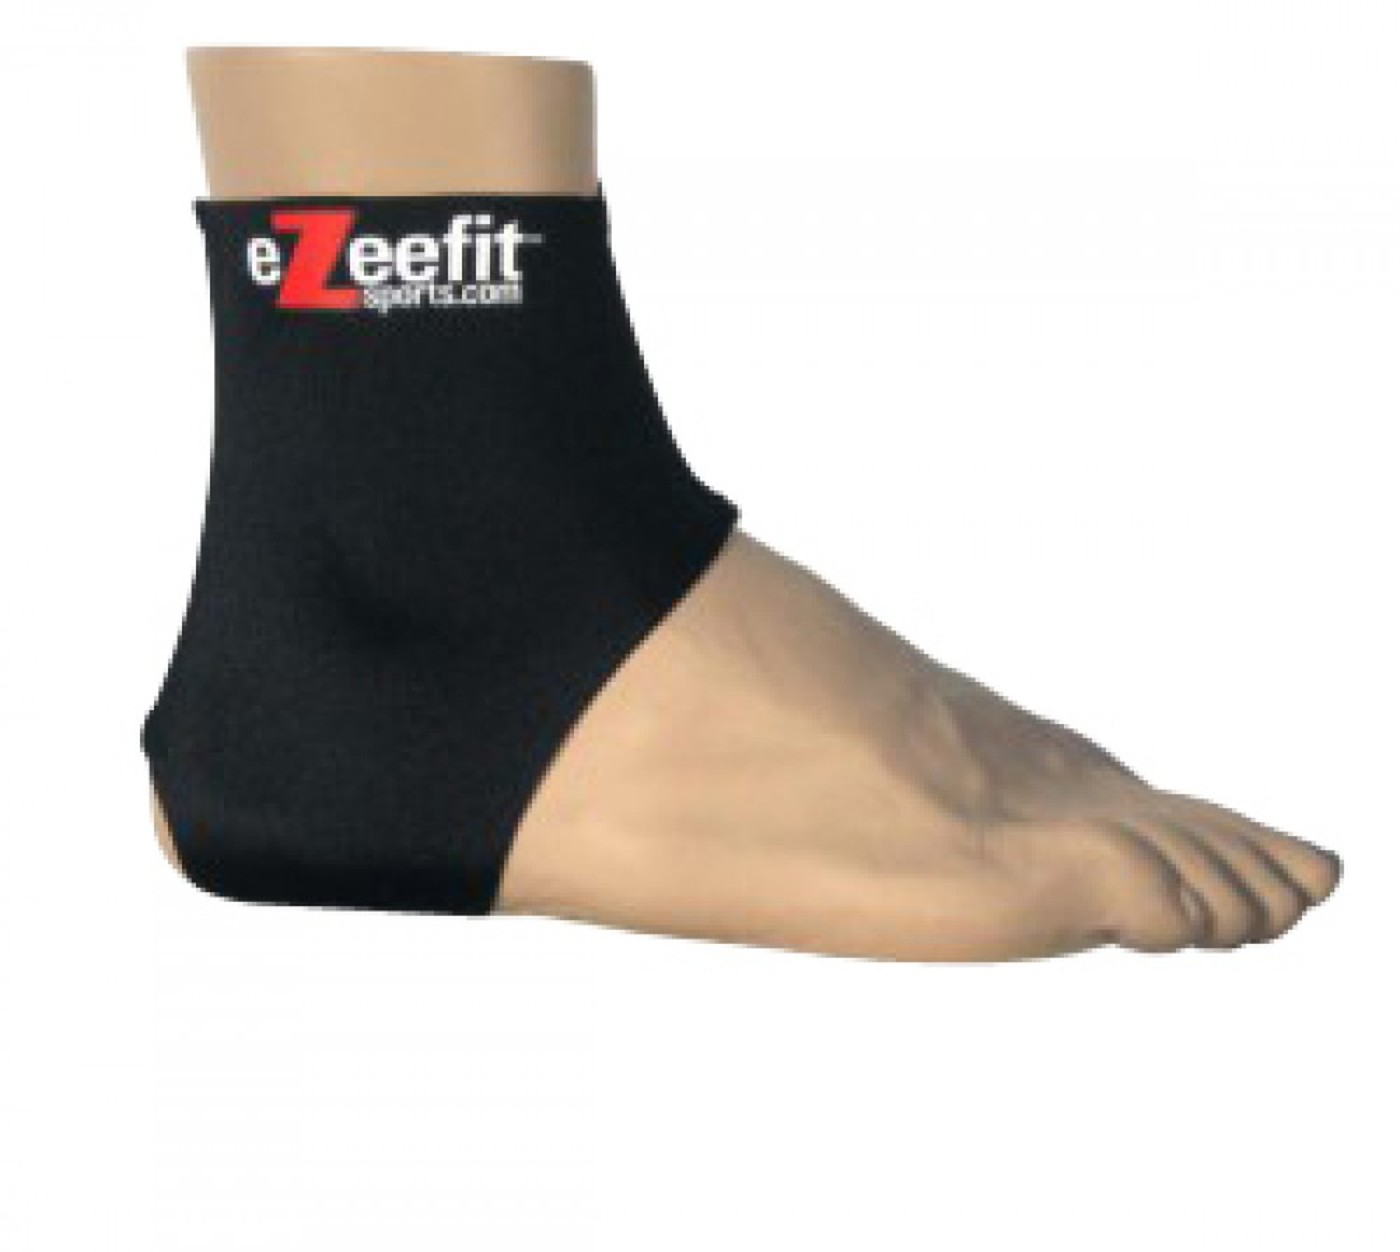 EZEEFIT ankle Booties ultrathin